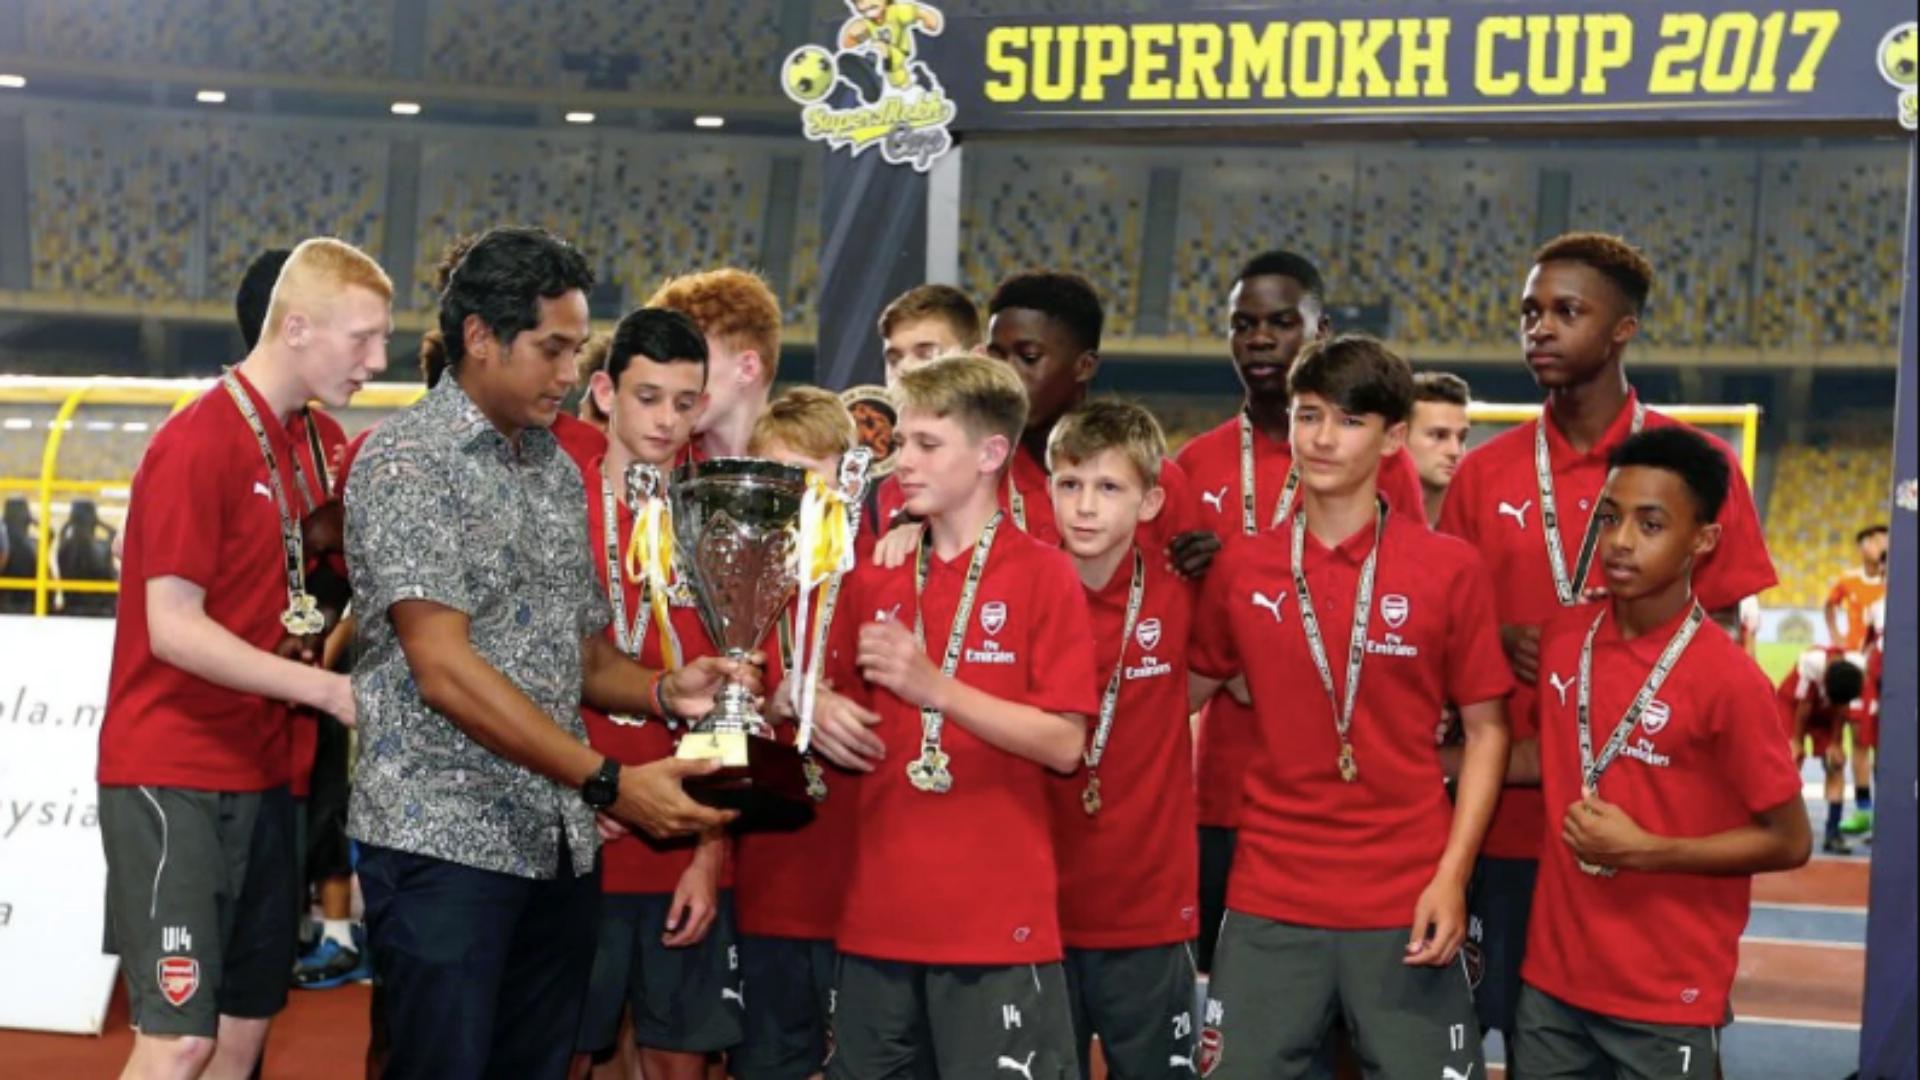 Arsenal U15s, SuperMokh Cup 2017